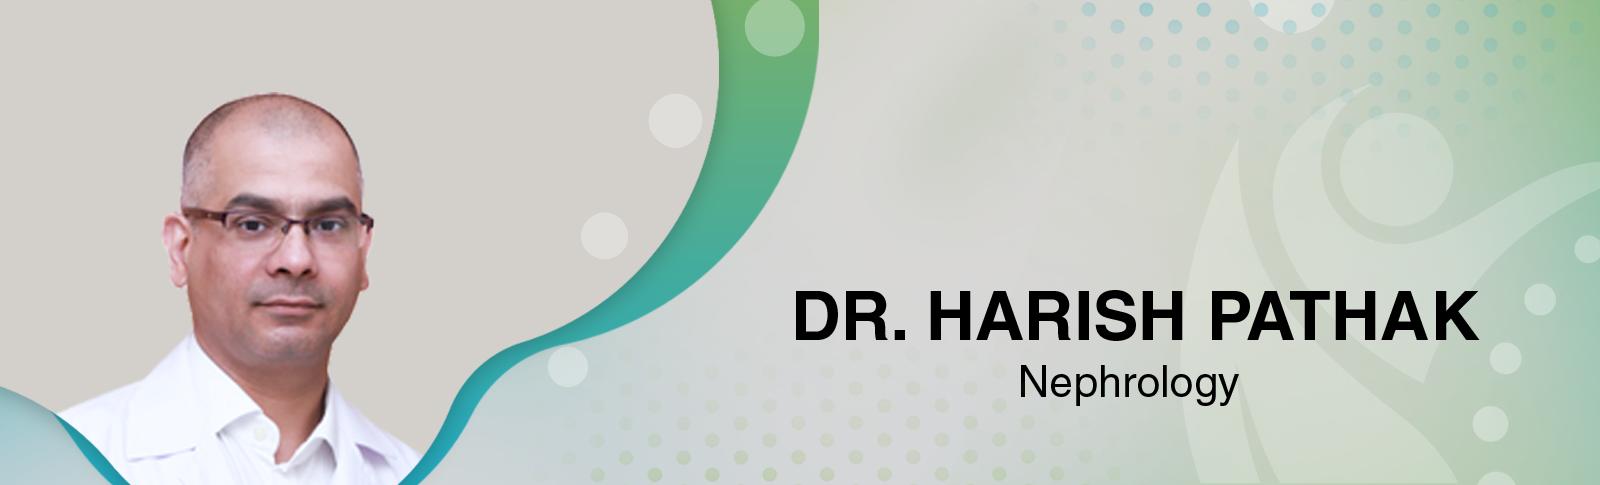 Dr. Harish Pathak